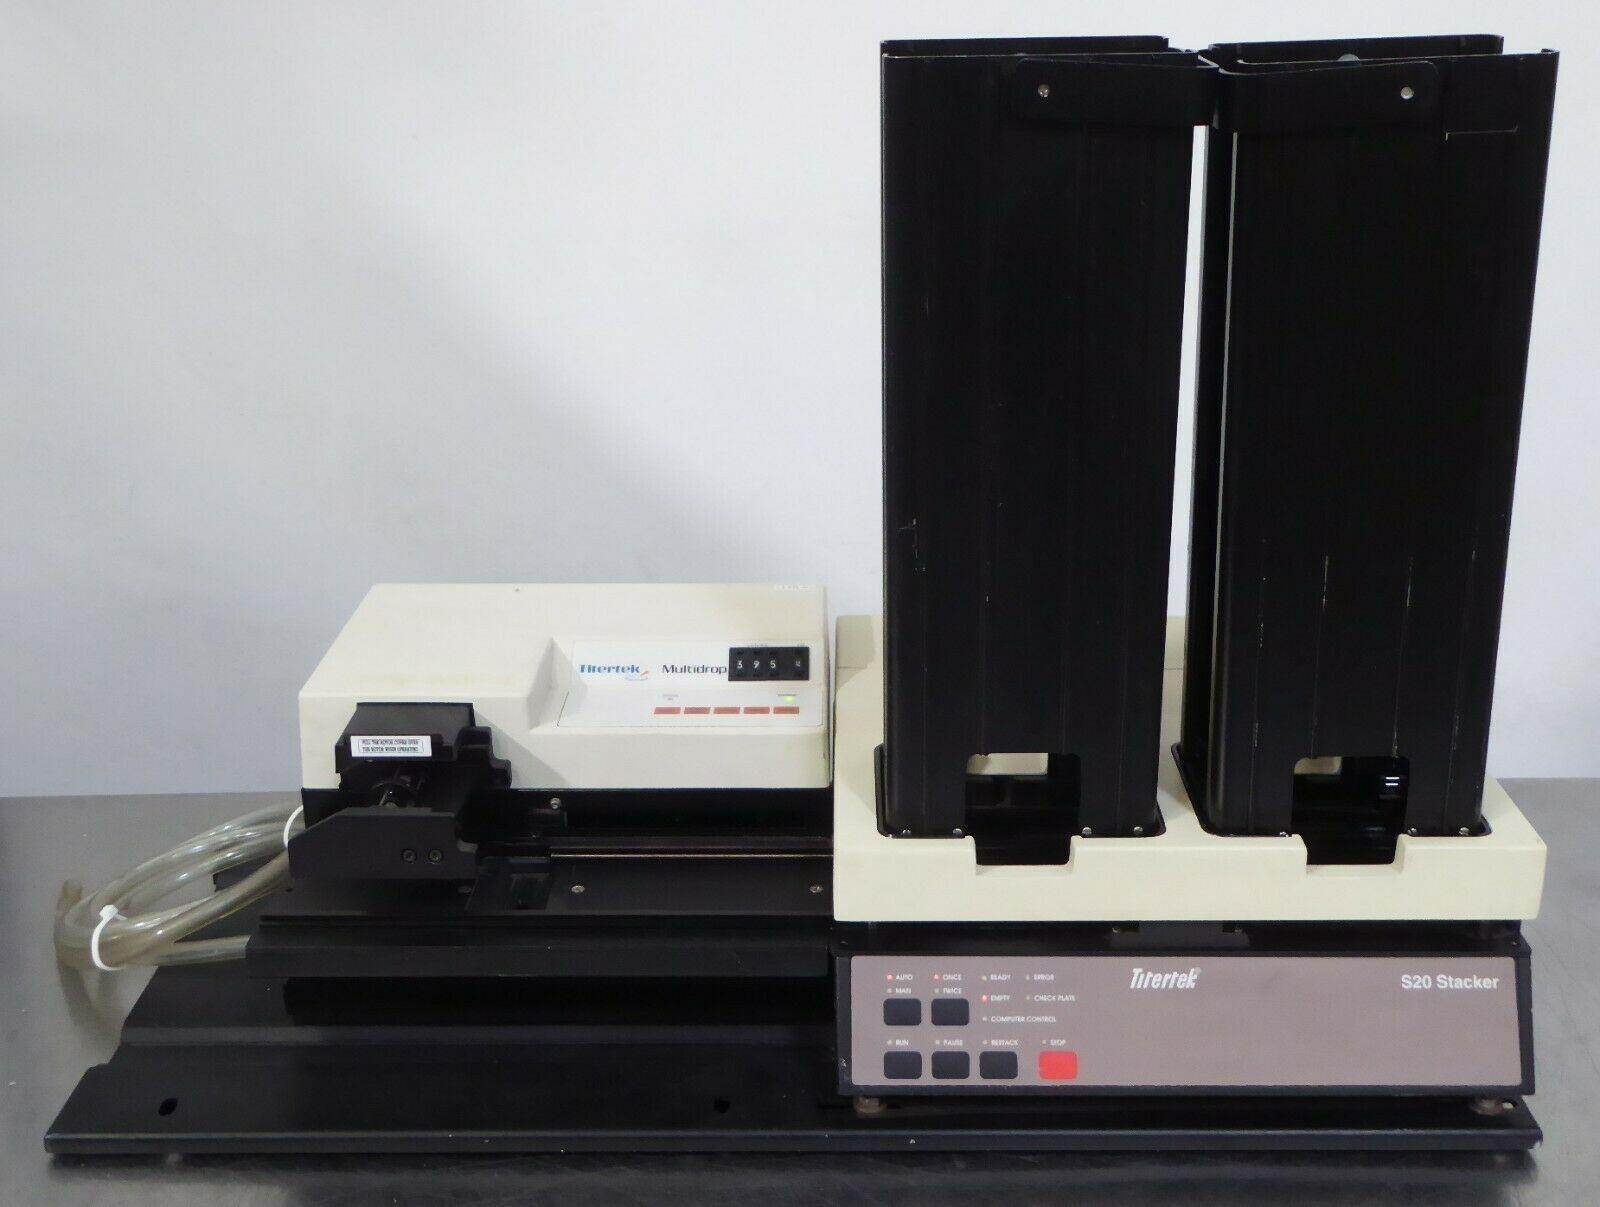 T164662 Titertek Multidrop Dispenser Type 831 w/ S20 Microplate Stacker